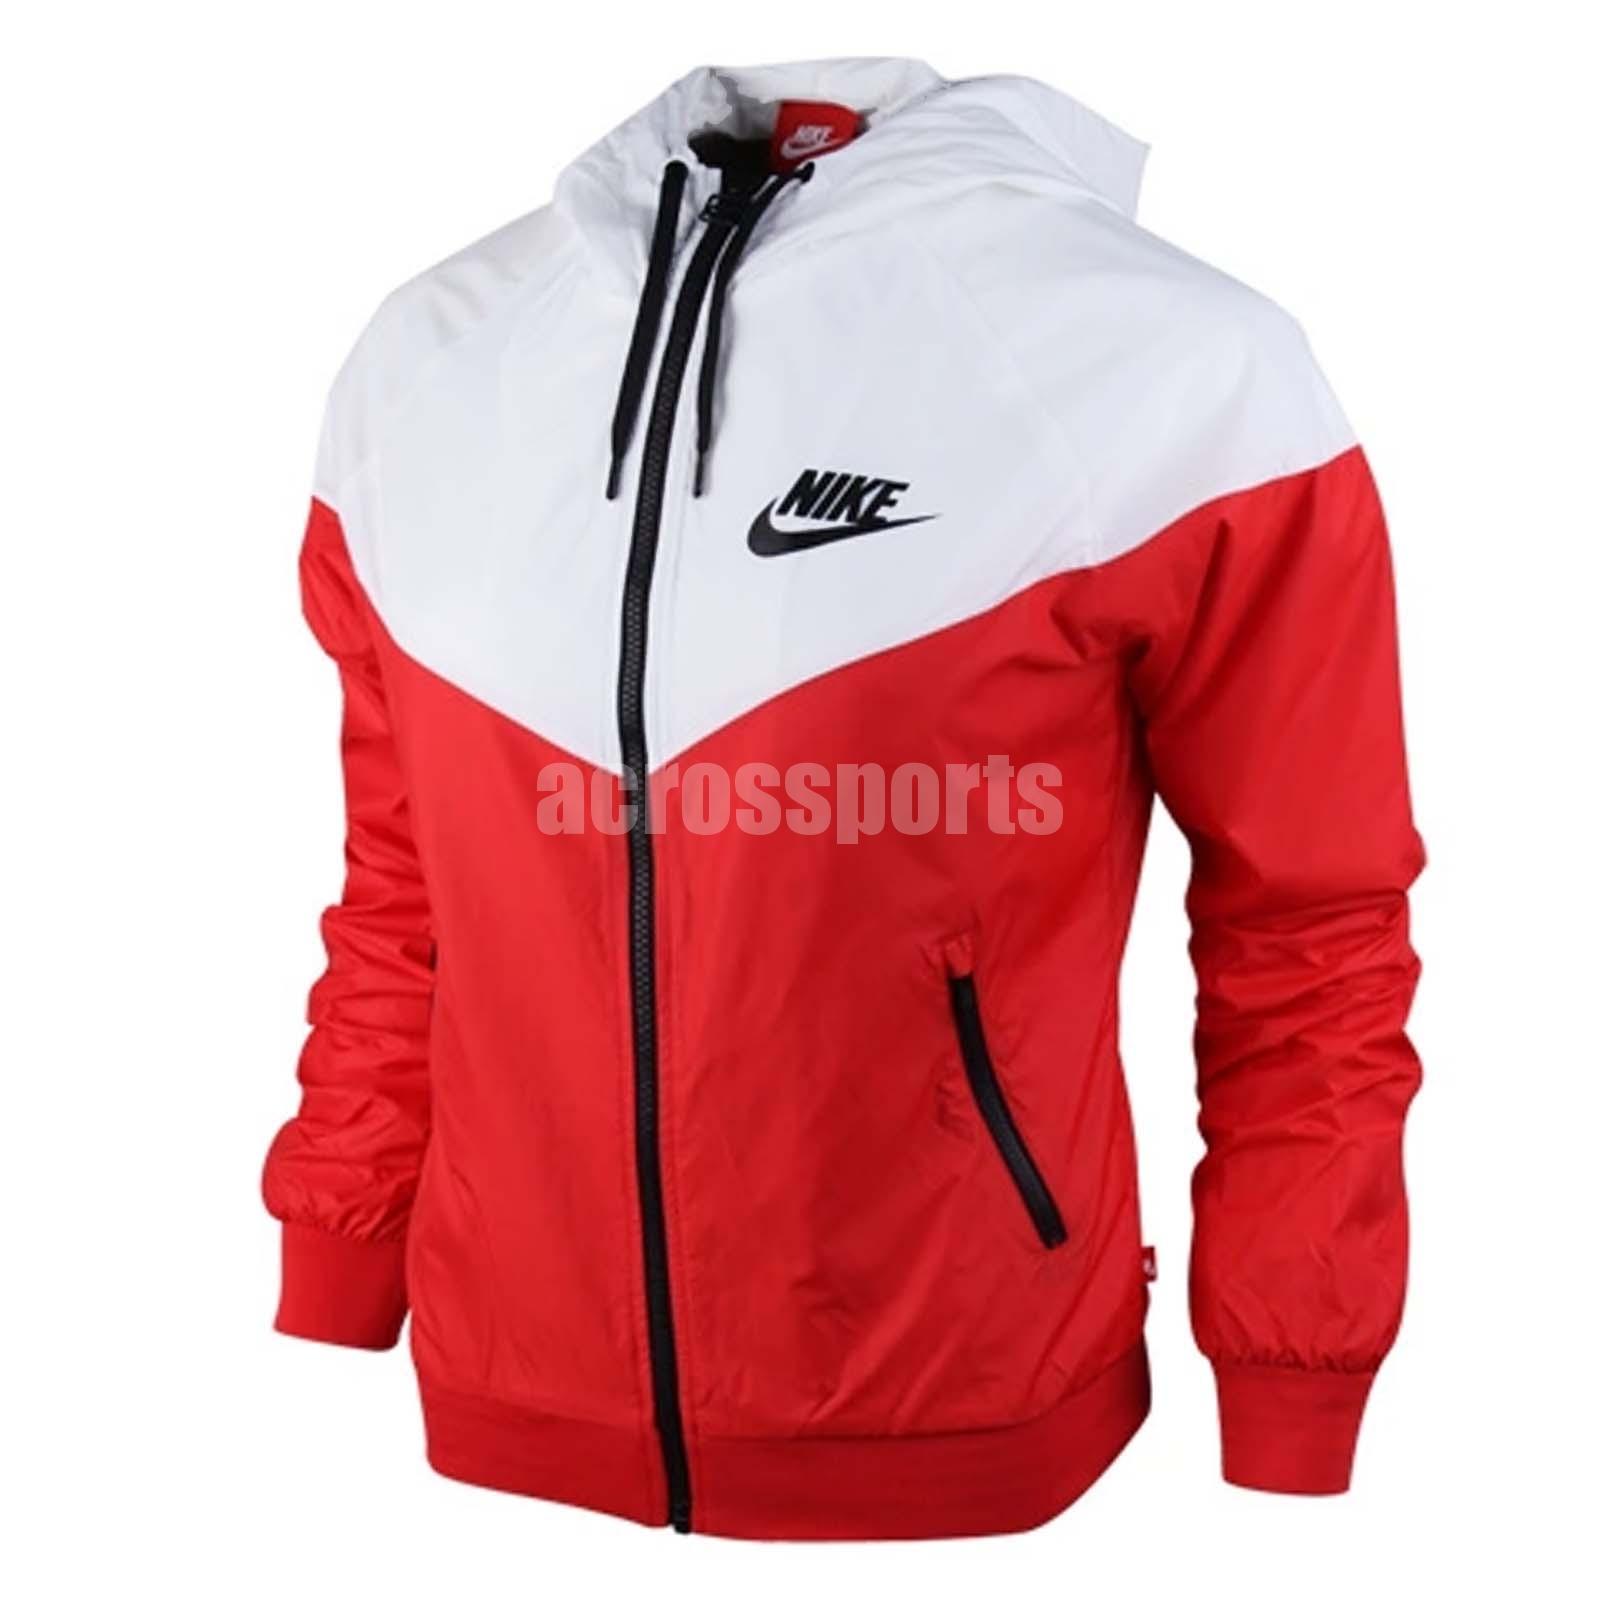 5dfc4756743a nike hoodie red